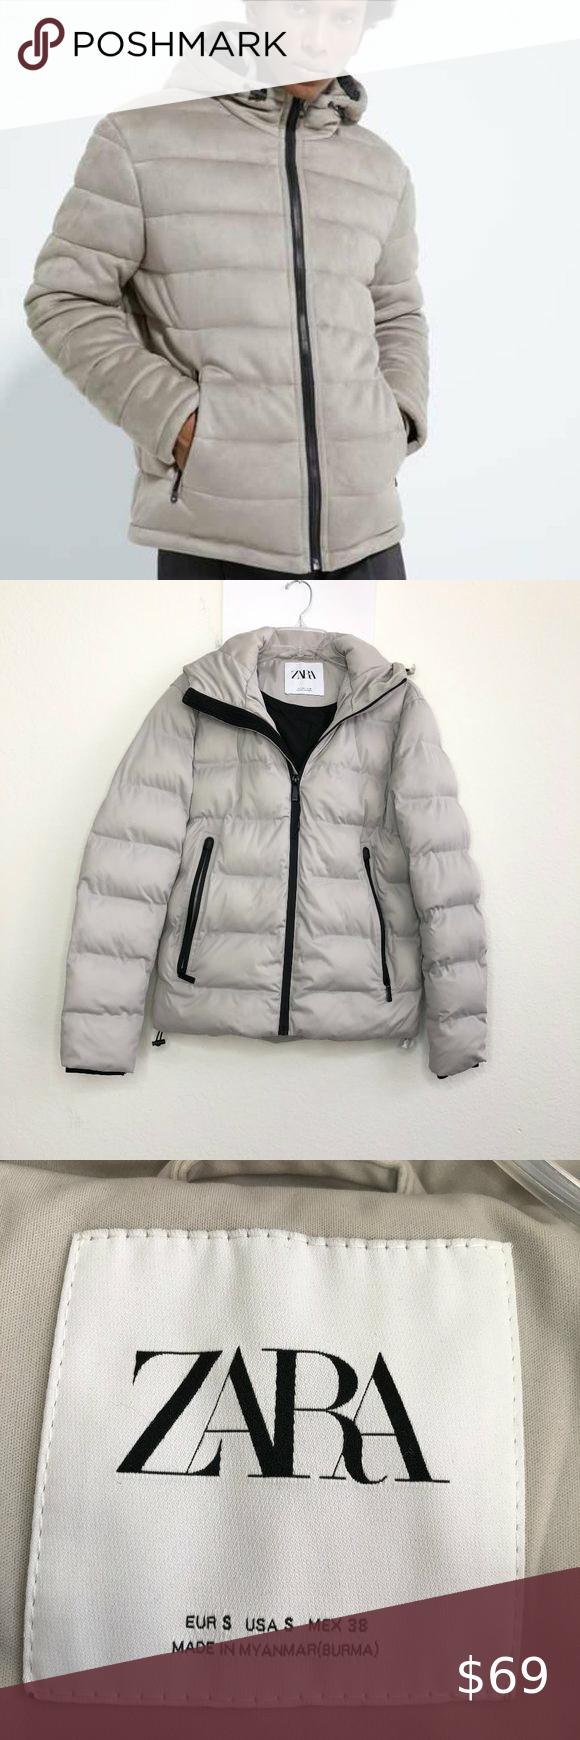 Zara Man Men S Hooded Puffer Jacket Size Hk Zara Man Mens Hooded Zara [ 1740 x 580 Pixel ]